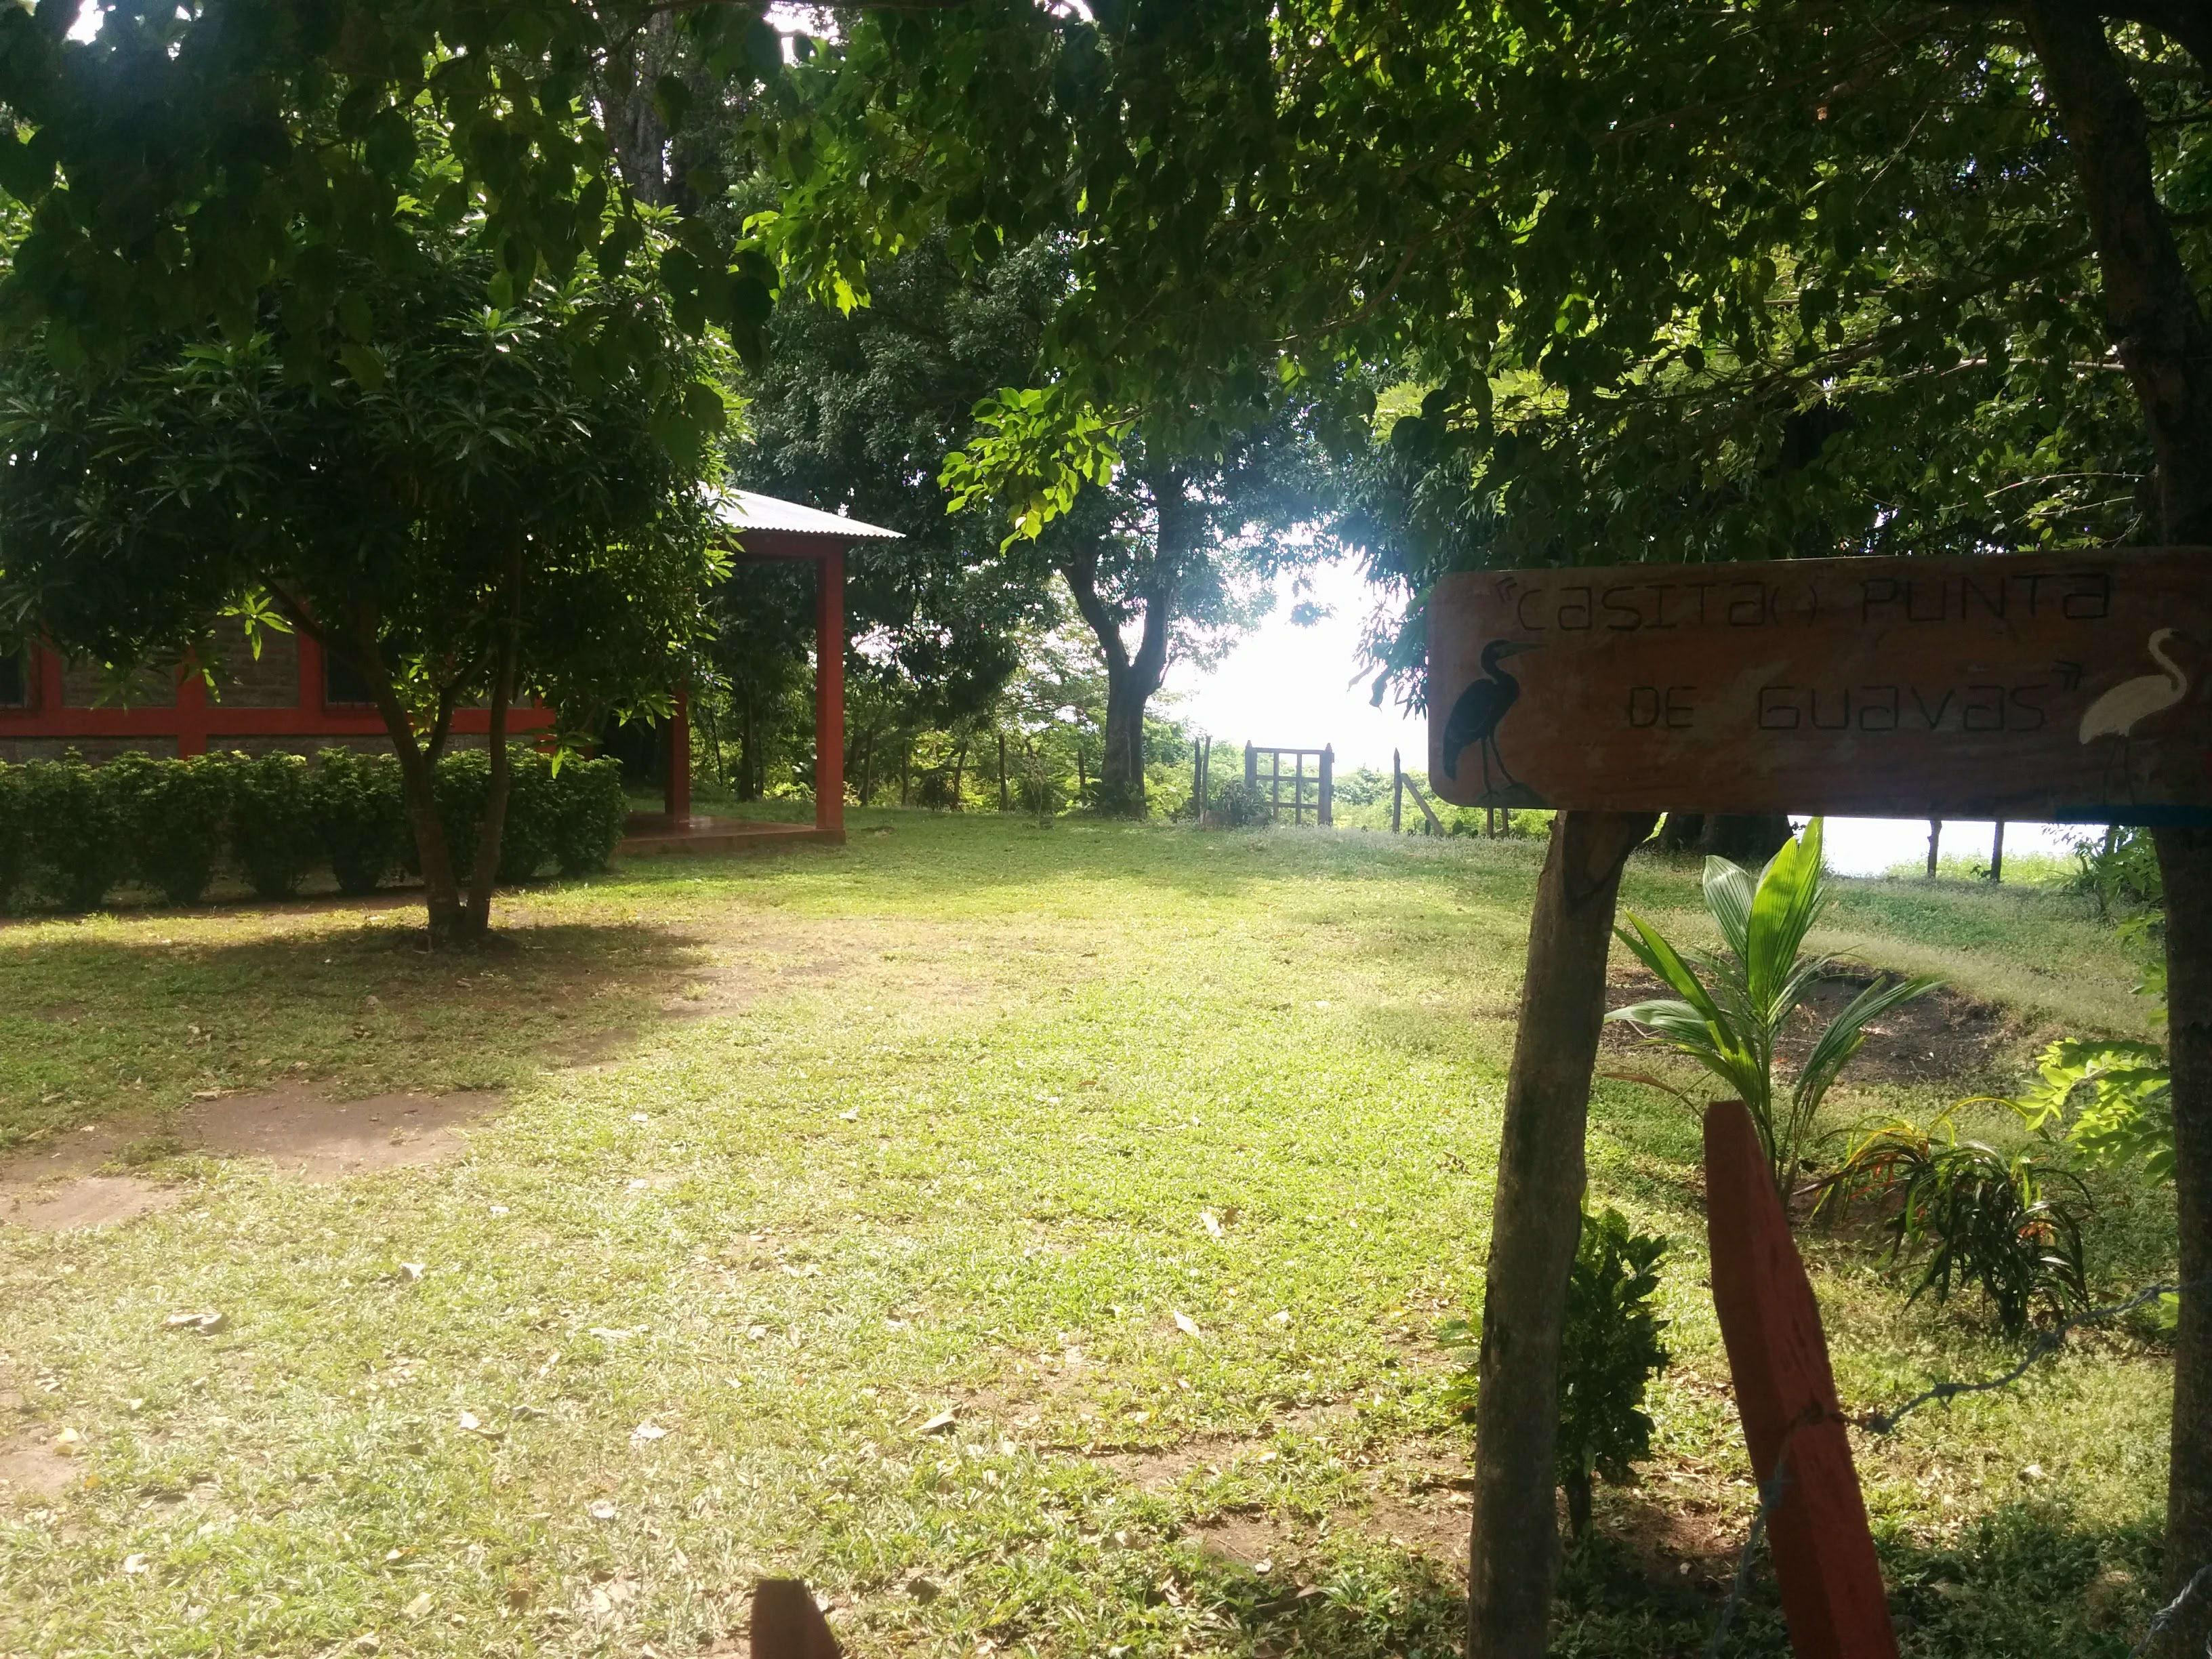 Casita and lake beyond